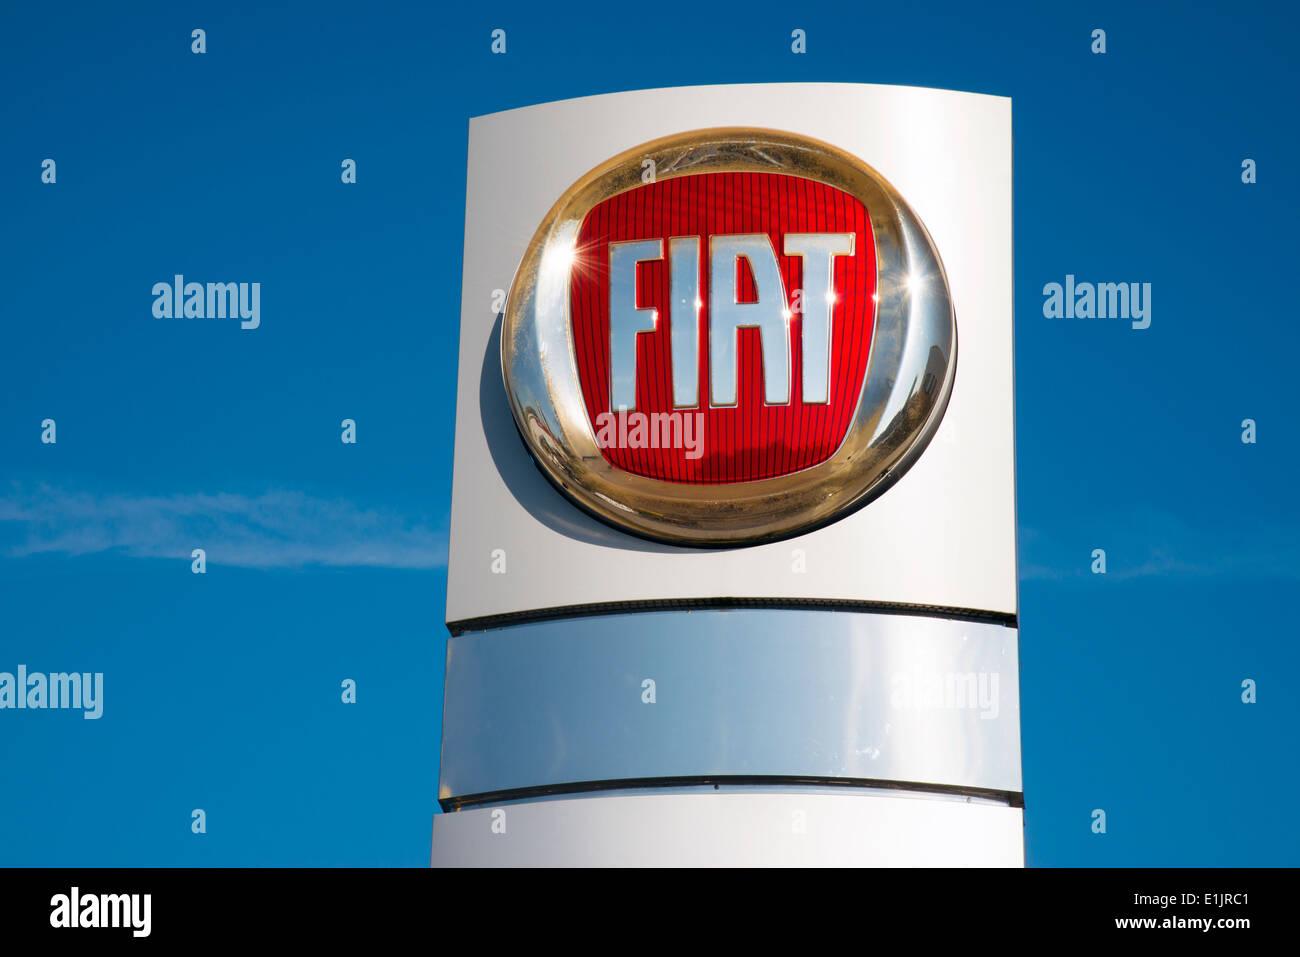 Fiat sign at a car dealership, UK. - Stock Image